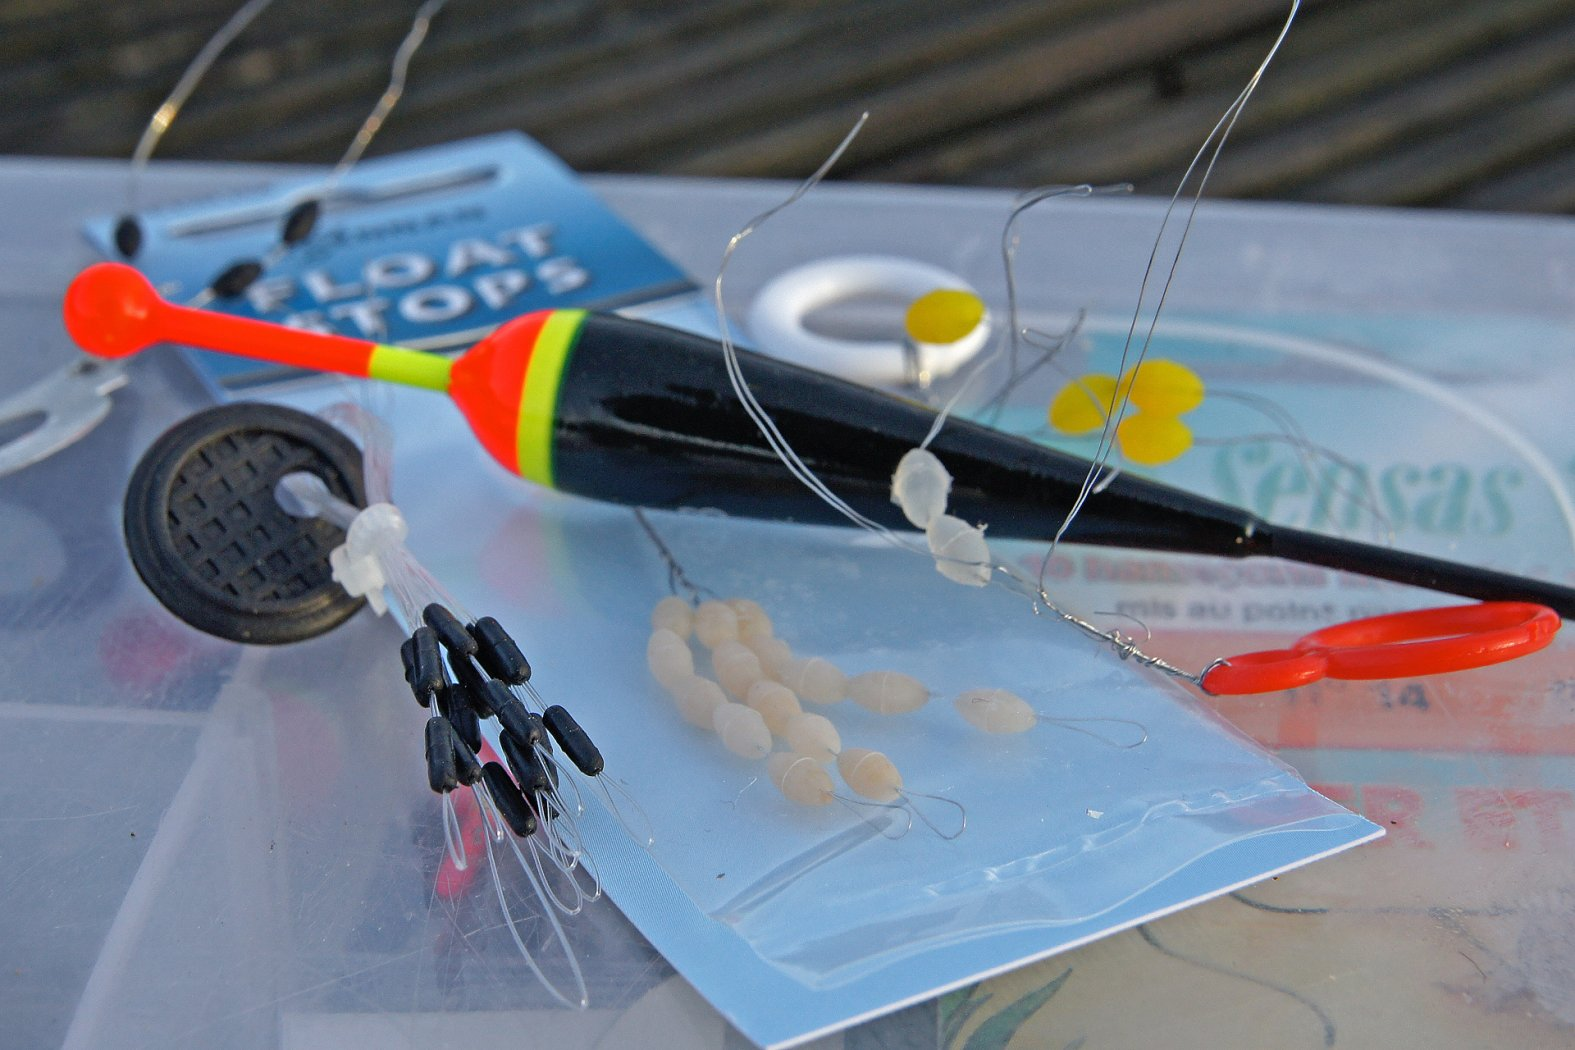 gummistopper aus silikon übersicht